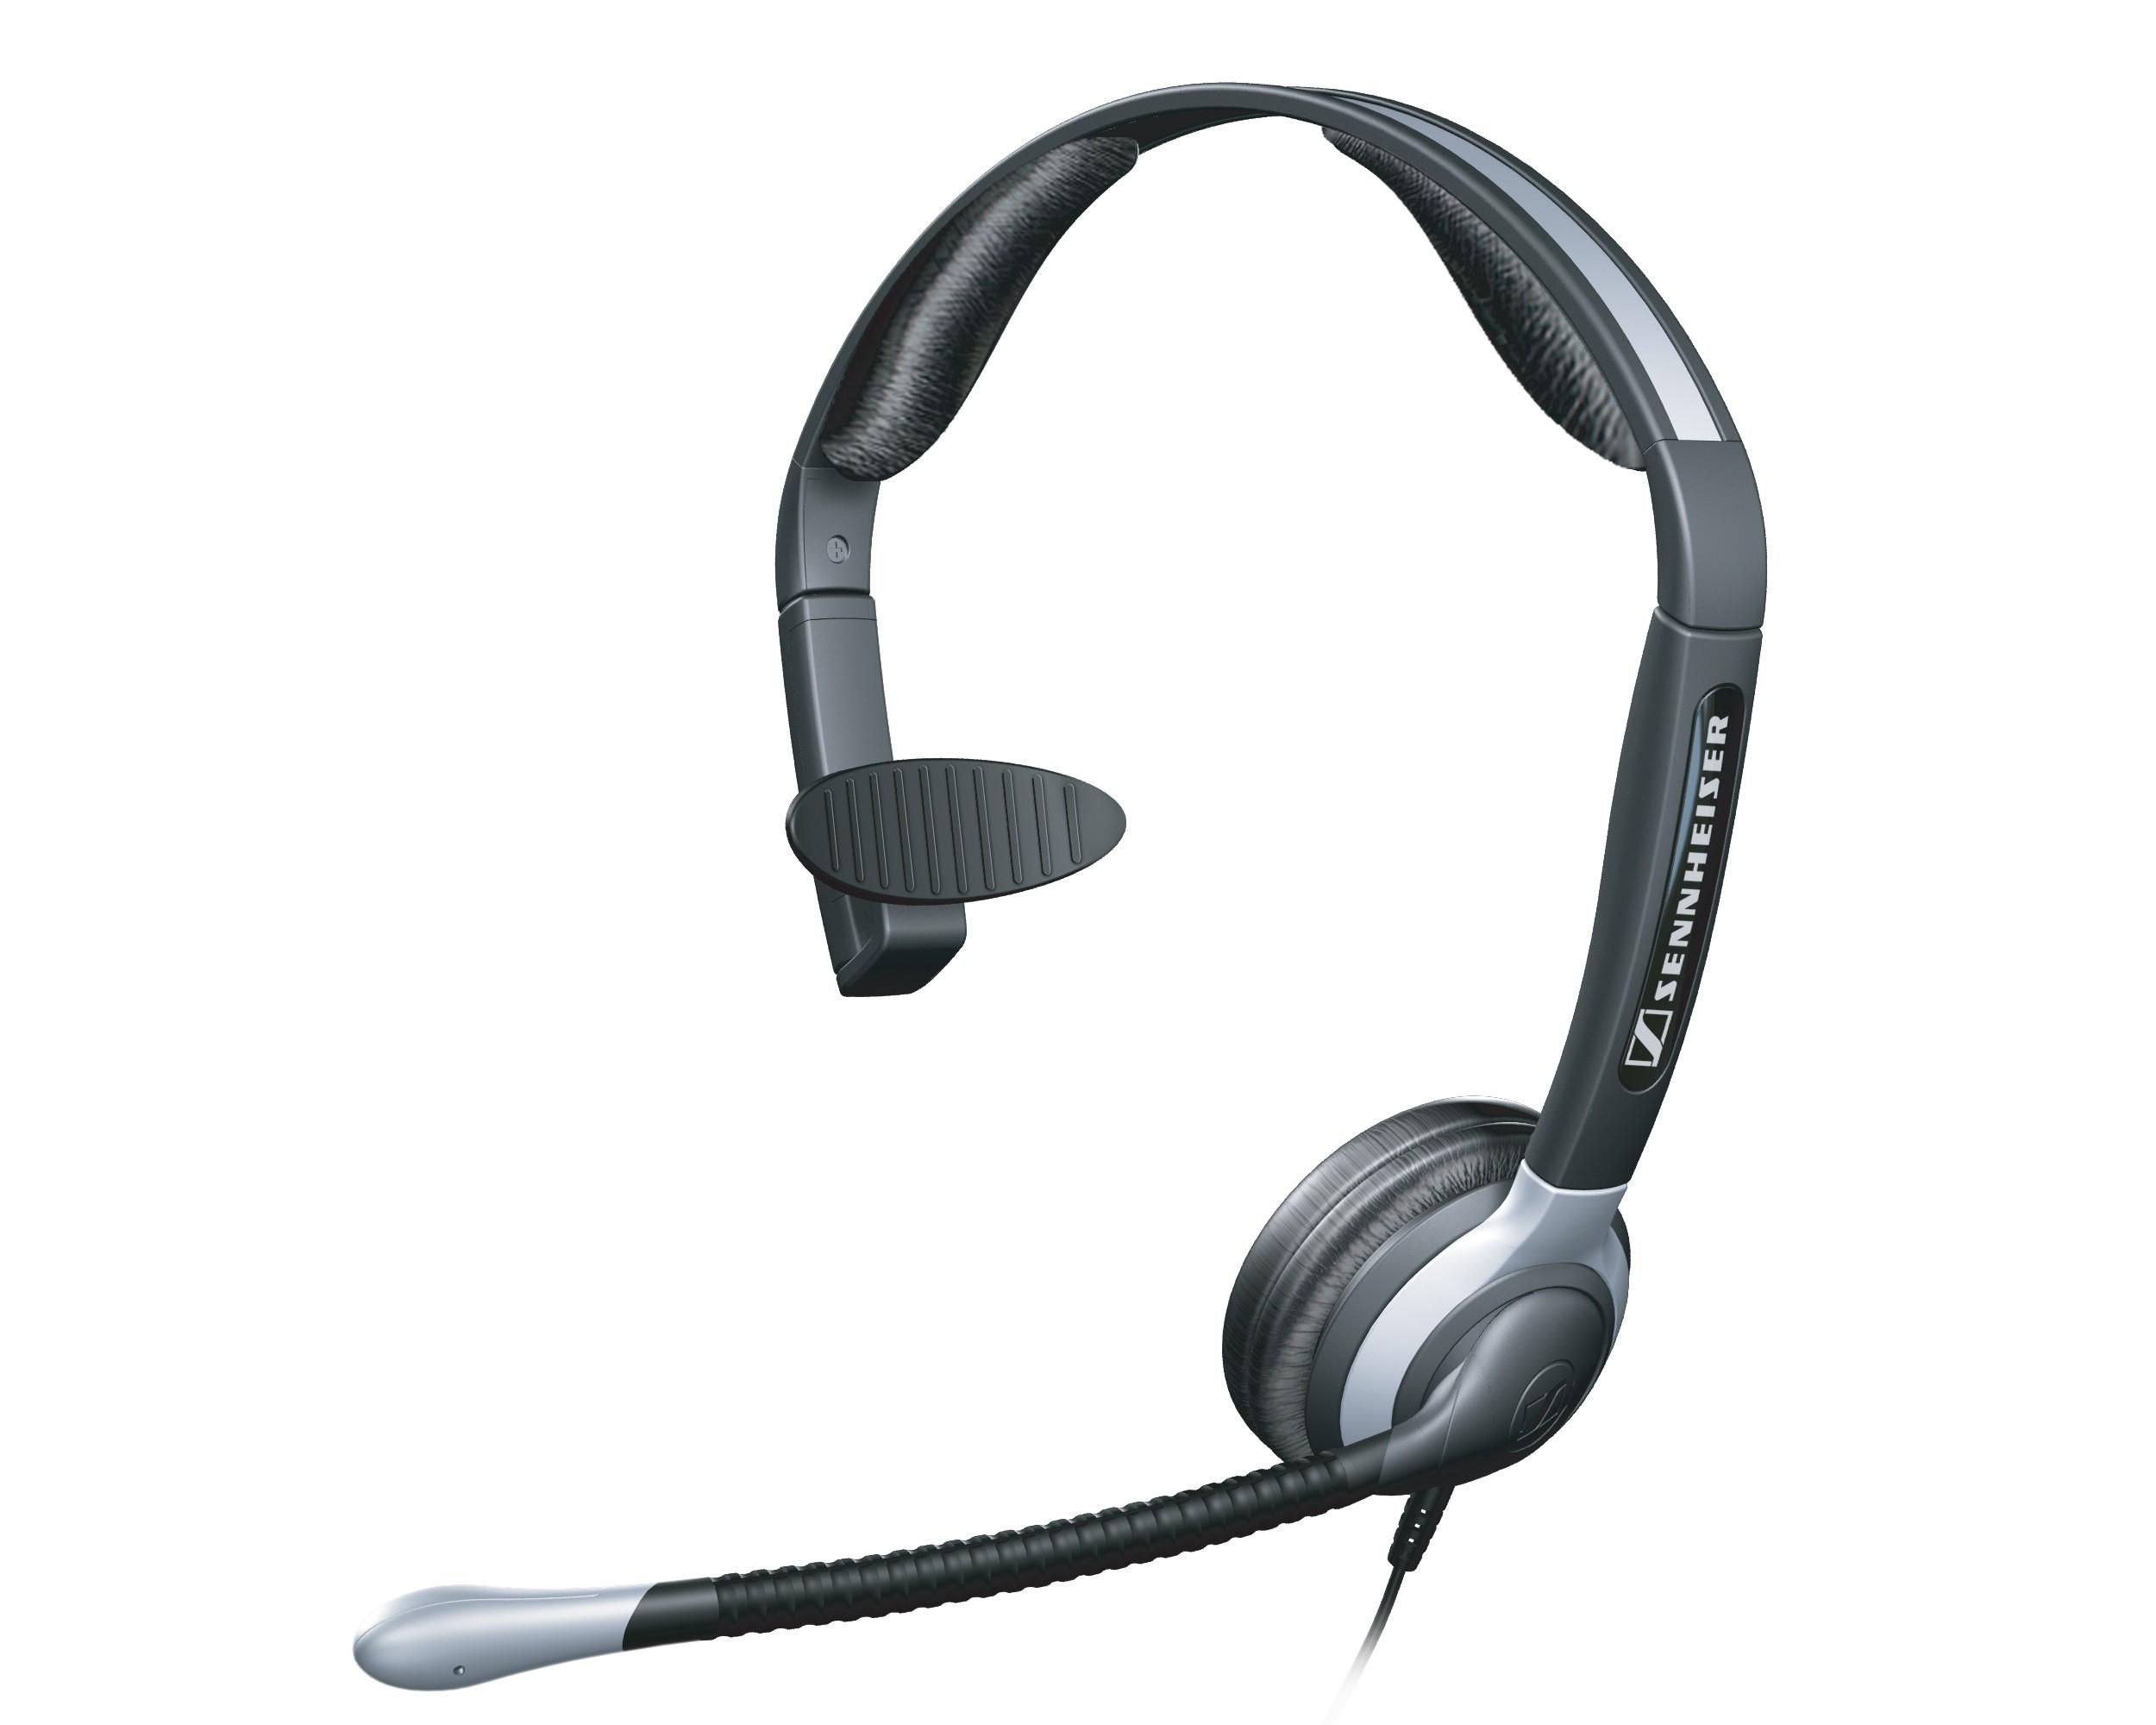 Sennheiser CC 510 Monaural Office Headset